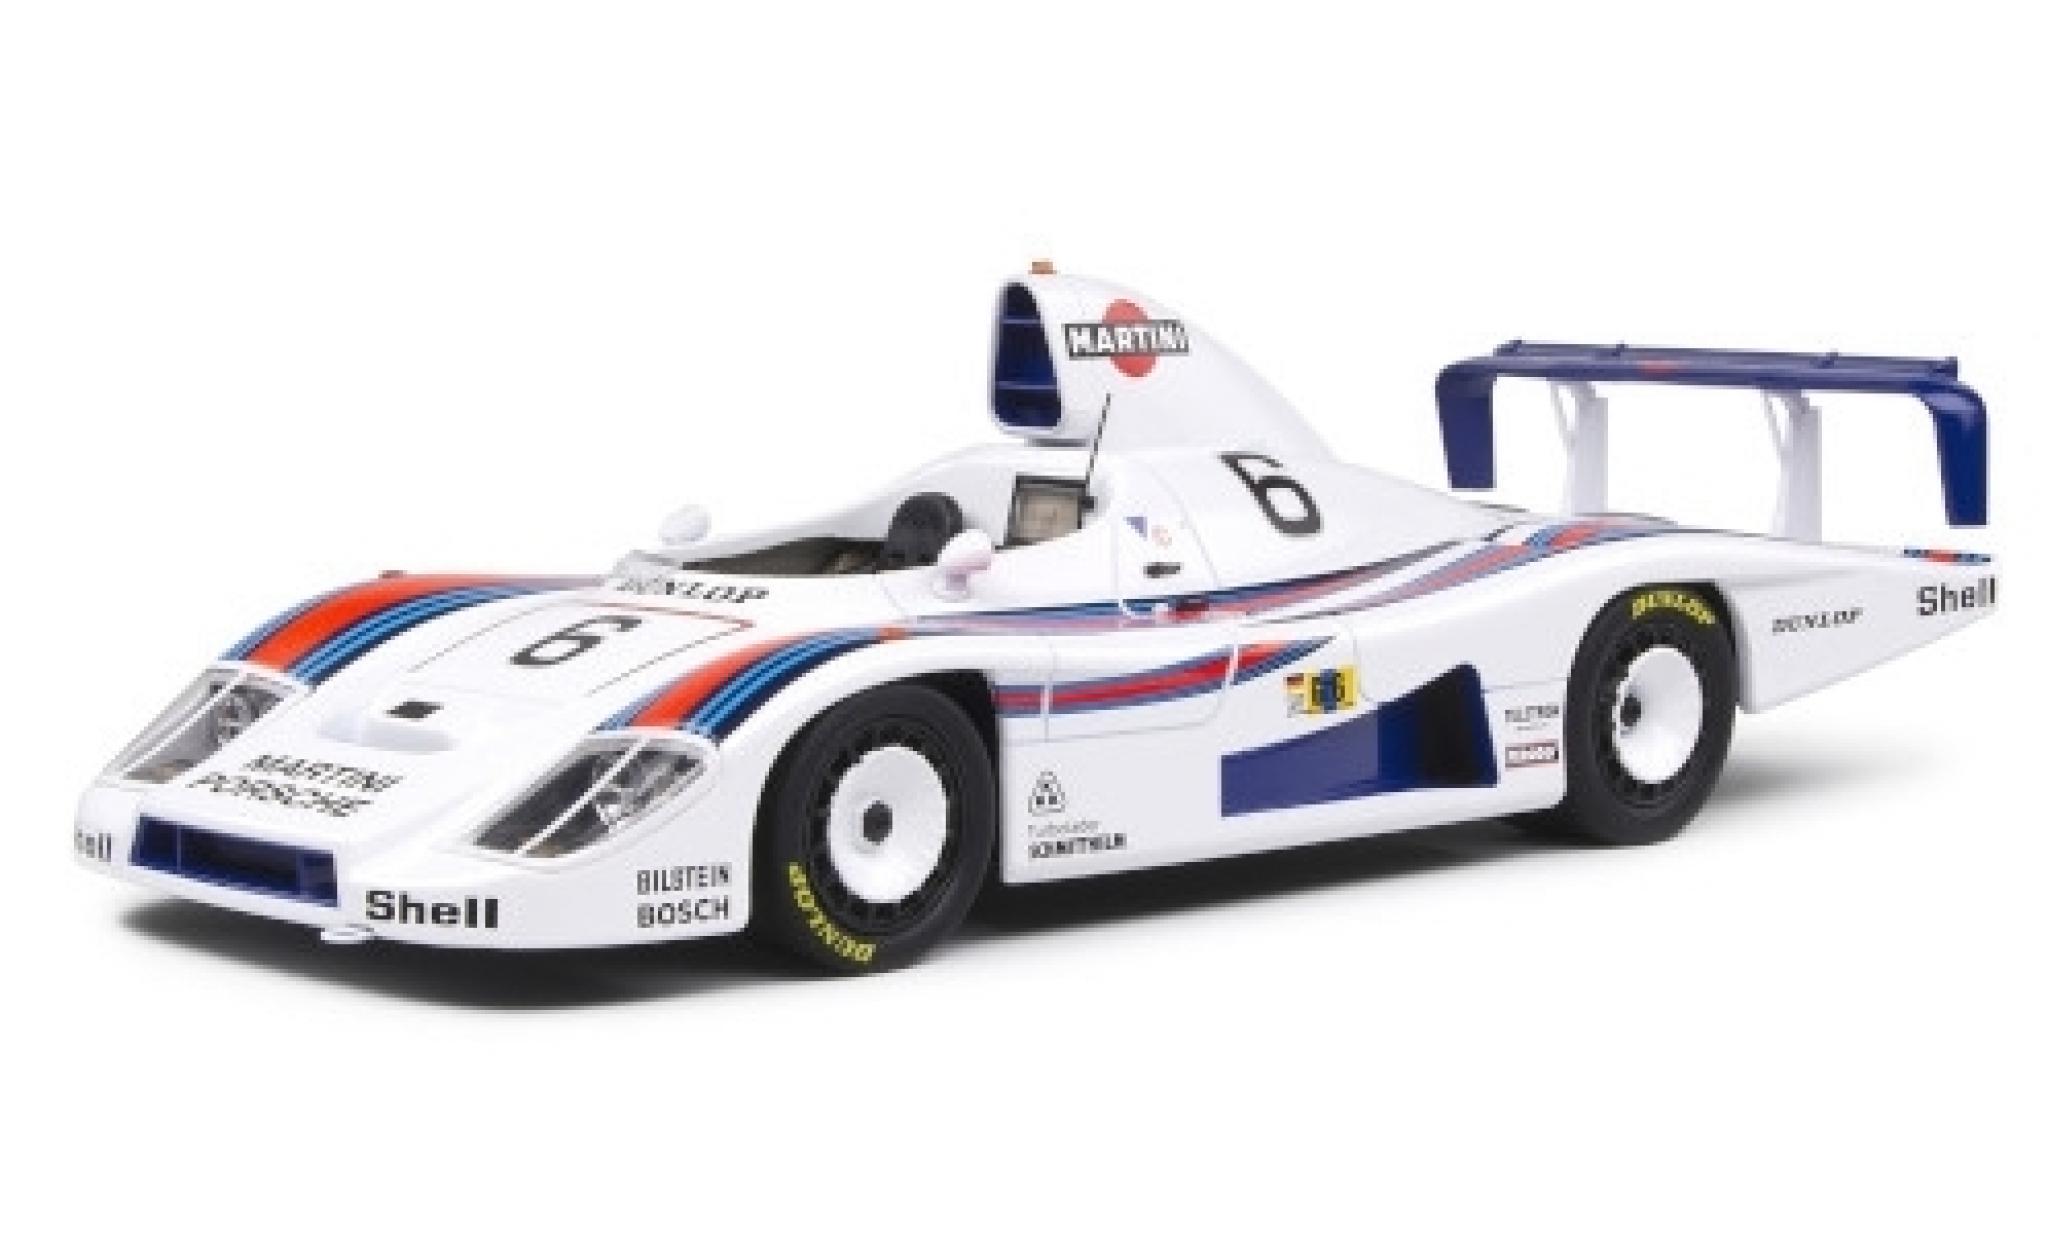 Porsche 936 1978 1/18 Solido /78 RHD No.6 Martini Racing System Martini 24h Le Mans B.Wollek/J.Barth/J.Ickx